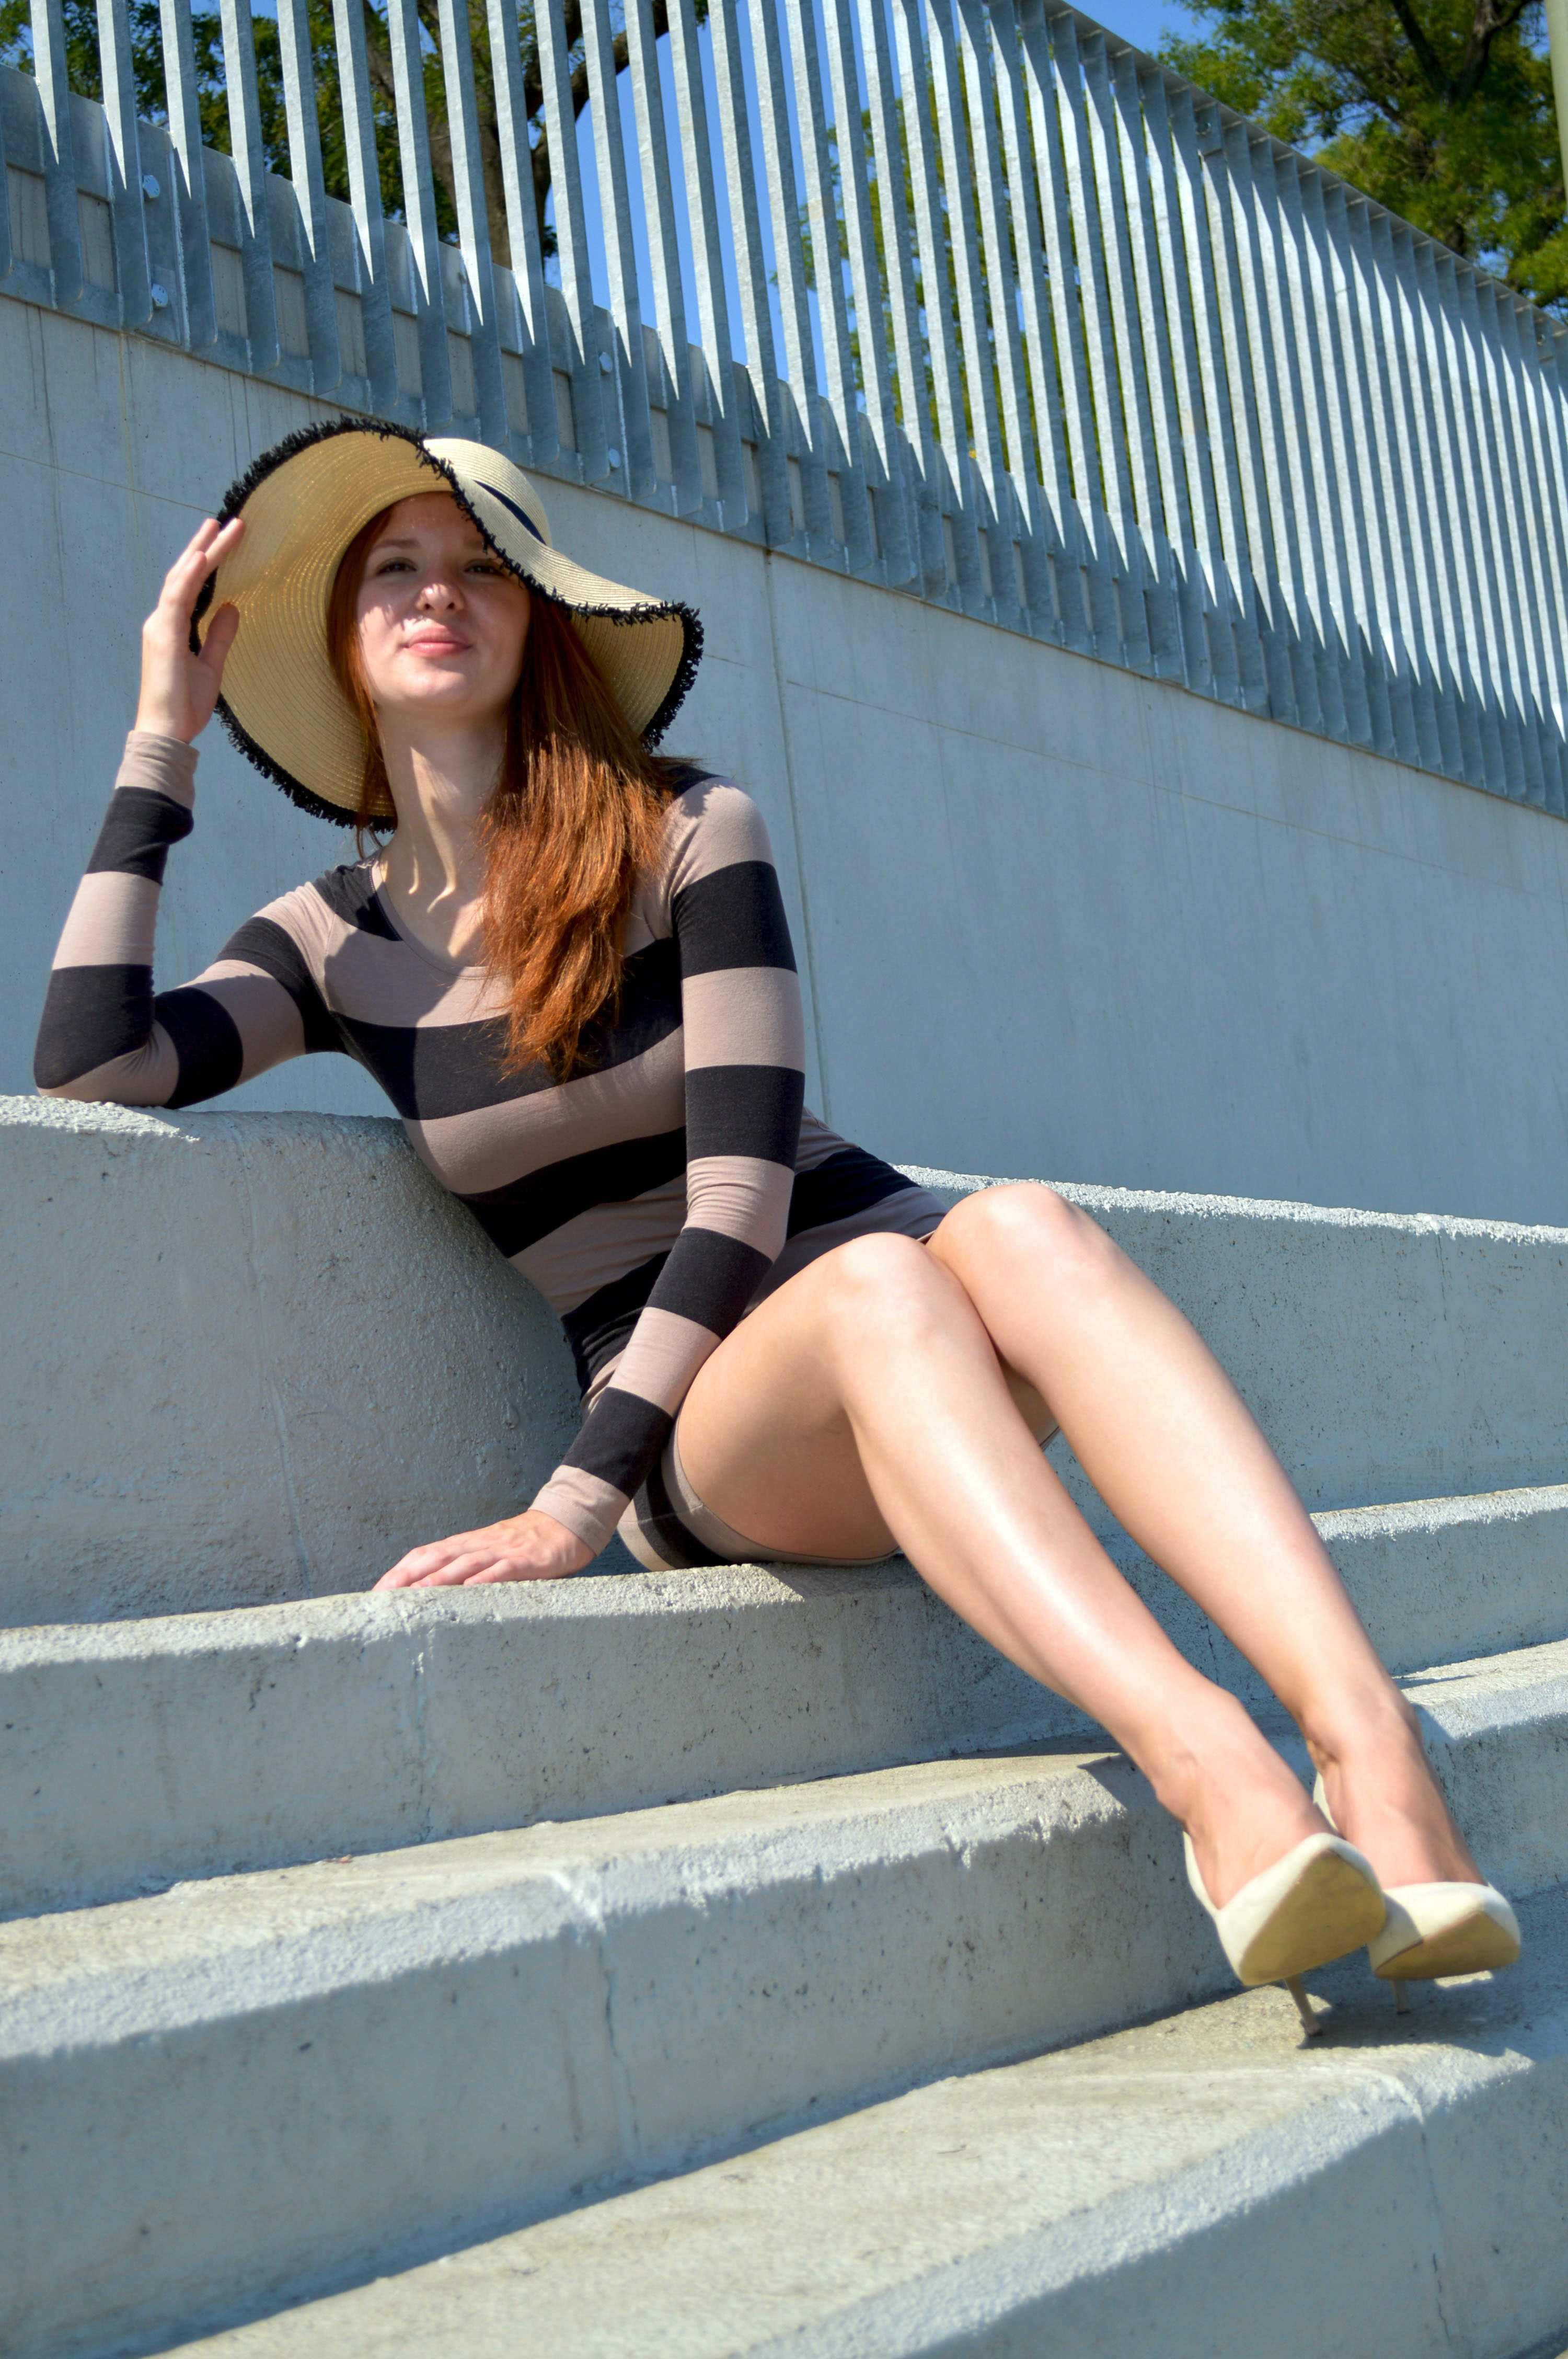 Laura Hoffmann's Model portfolio